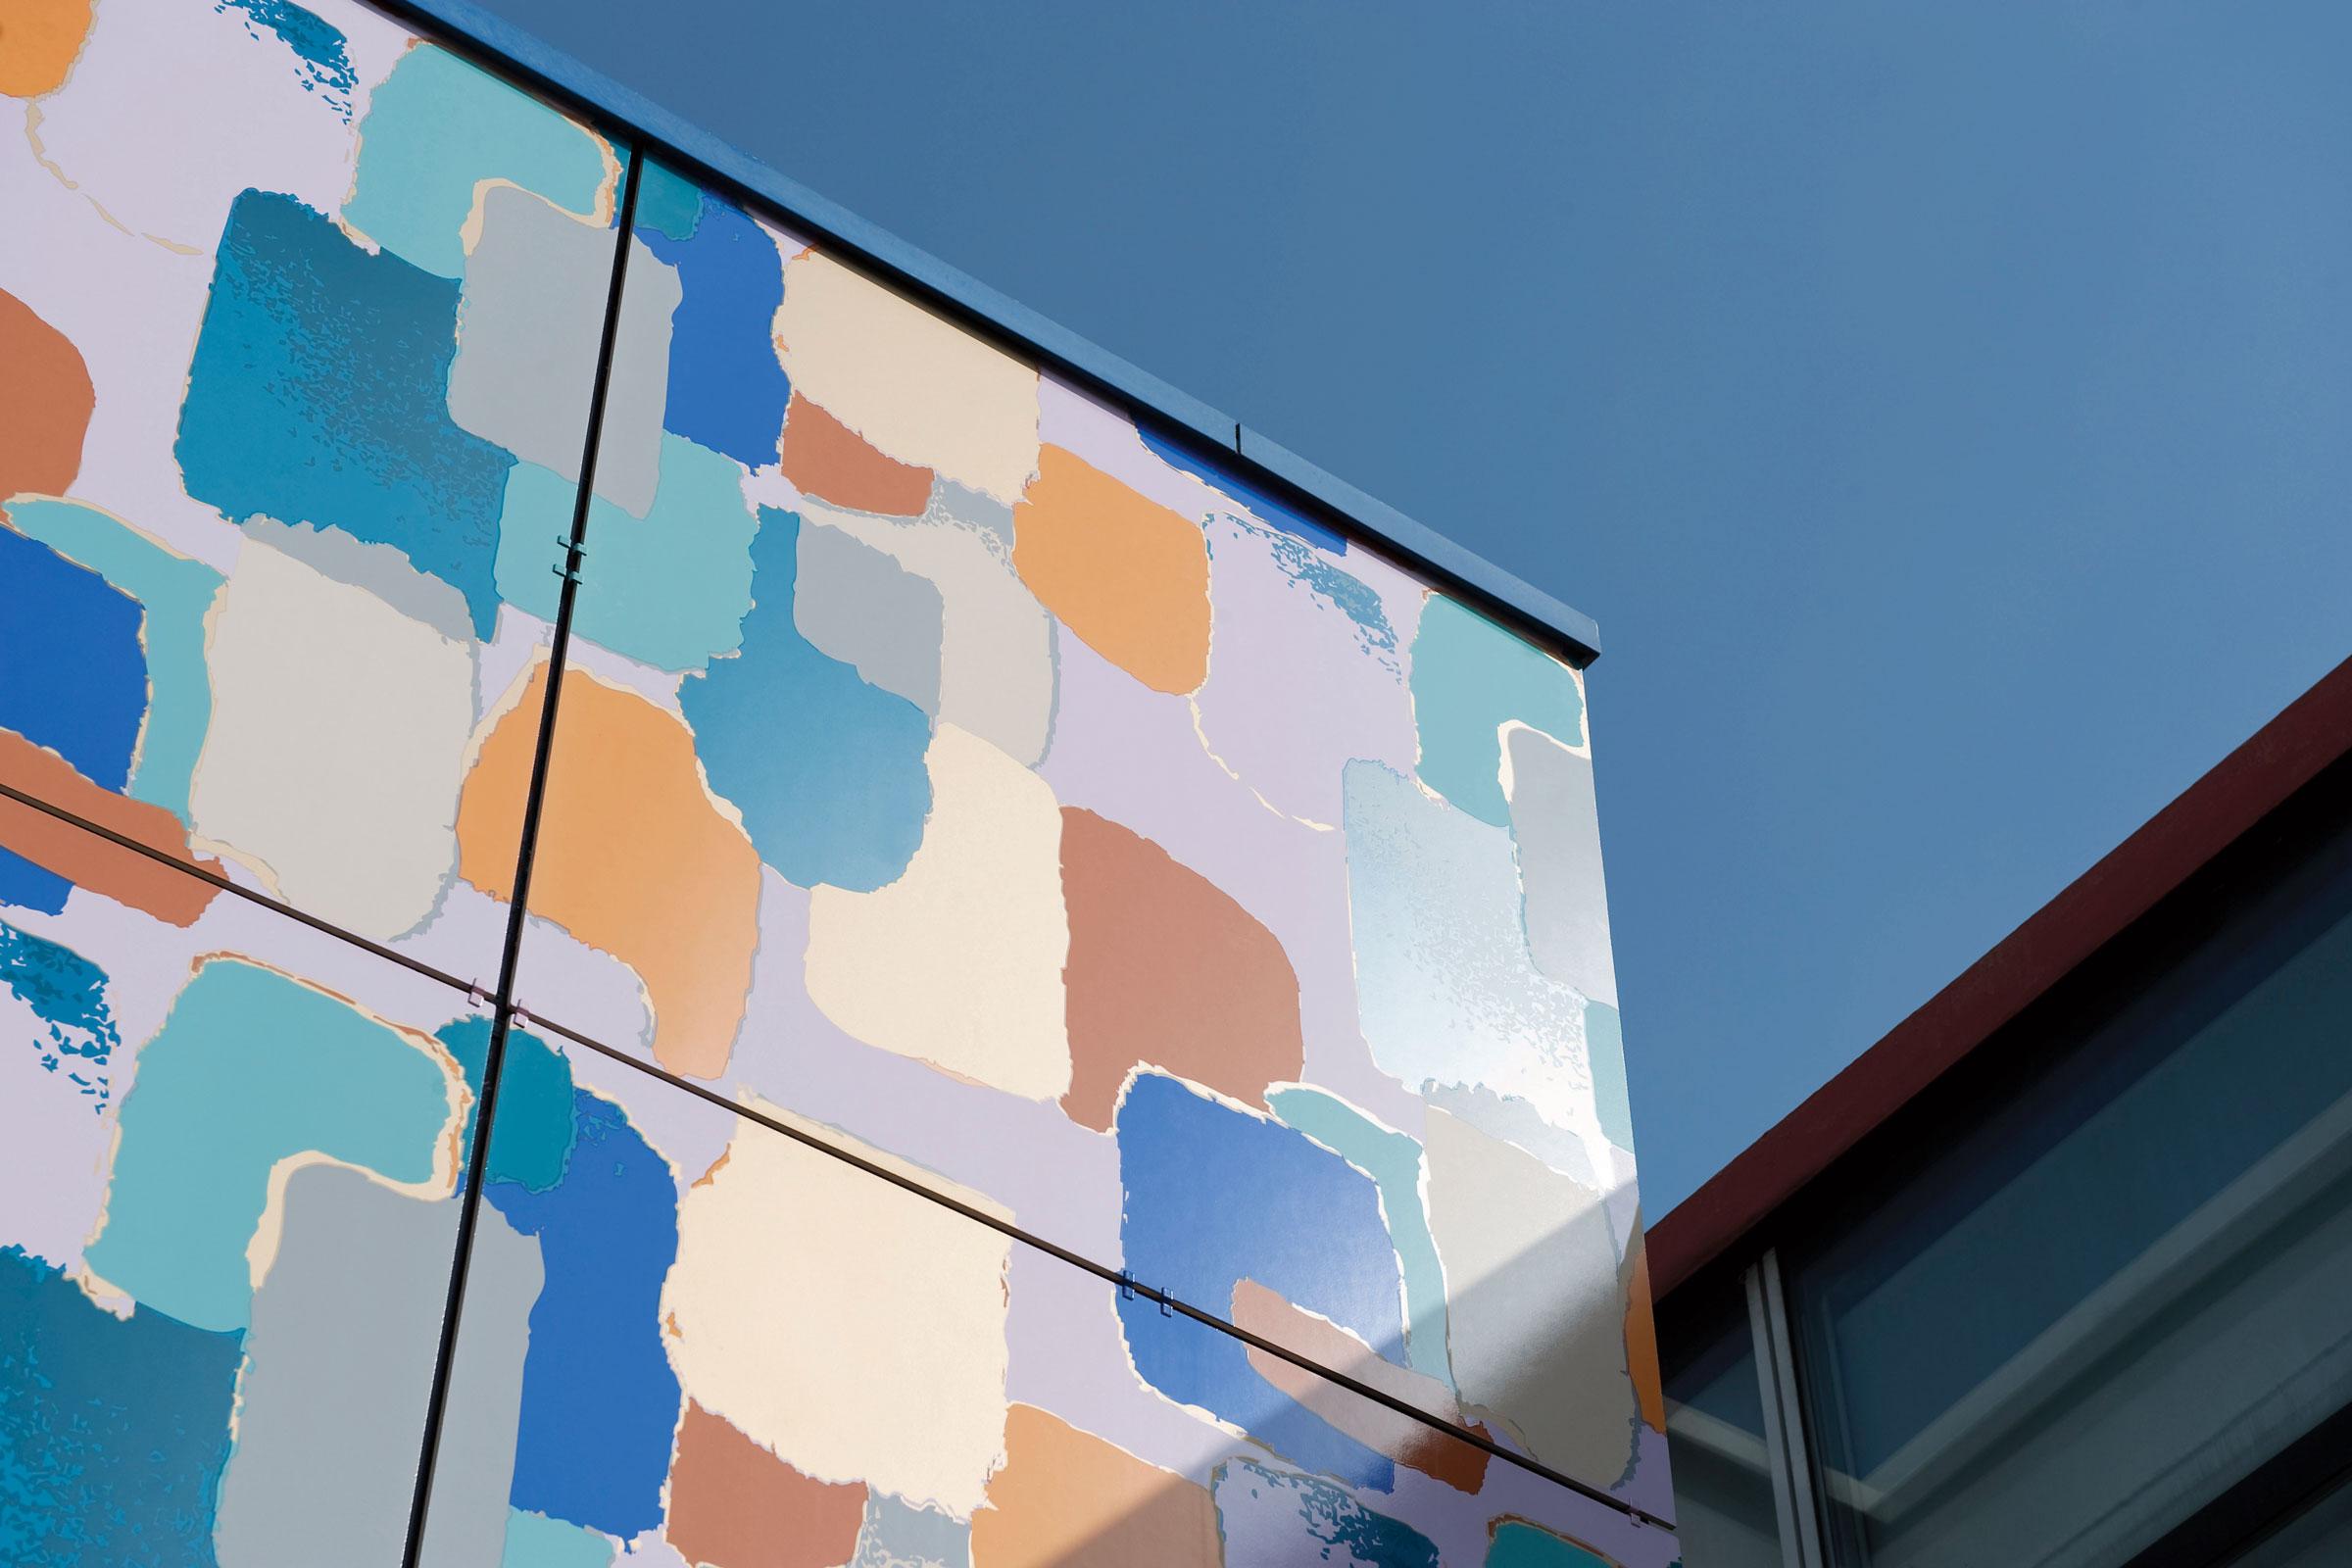 museum groningen grob buchtal-acme-brick-ceramic facade systems gbd magazine 02